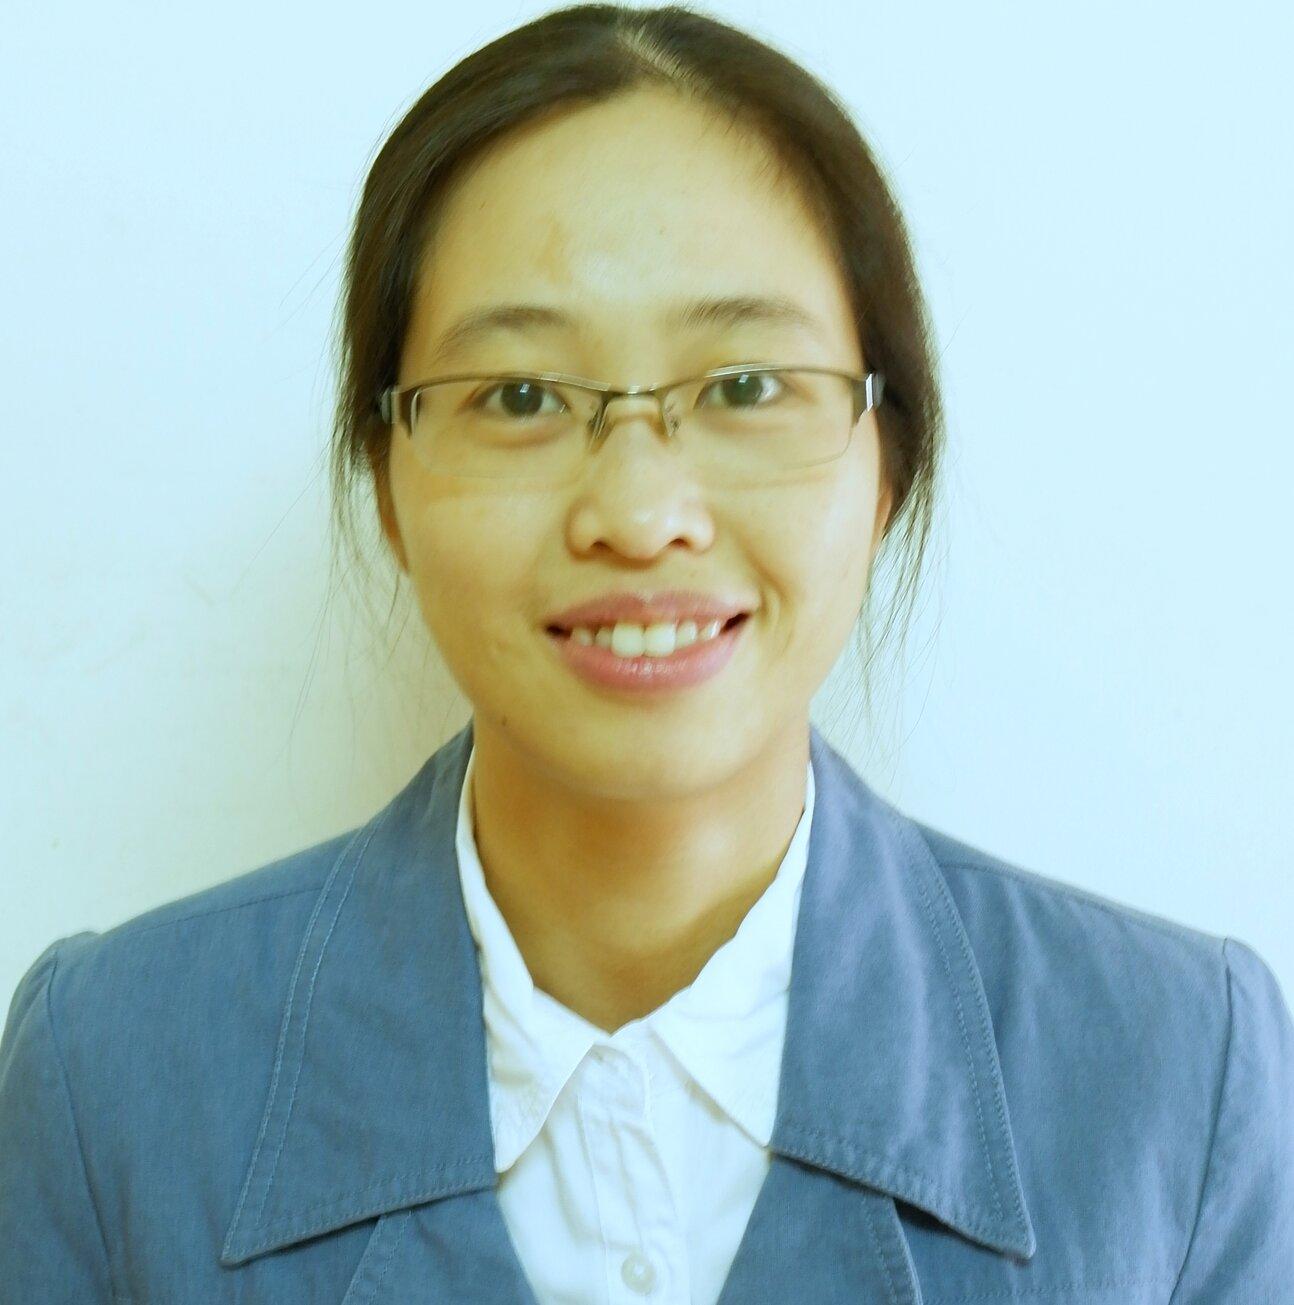 Thanh-Loan Nguyen